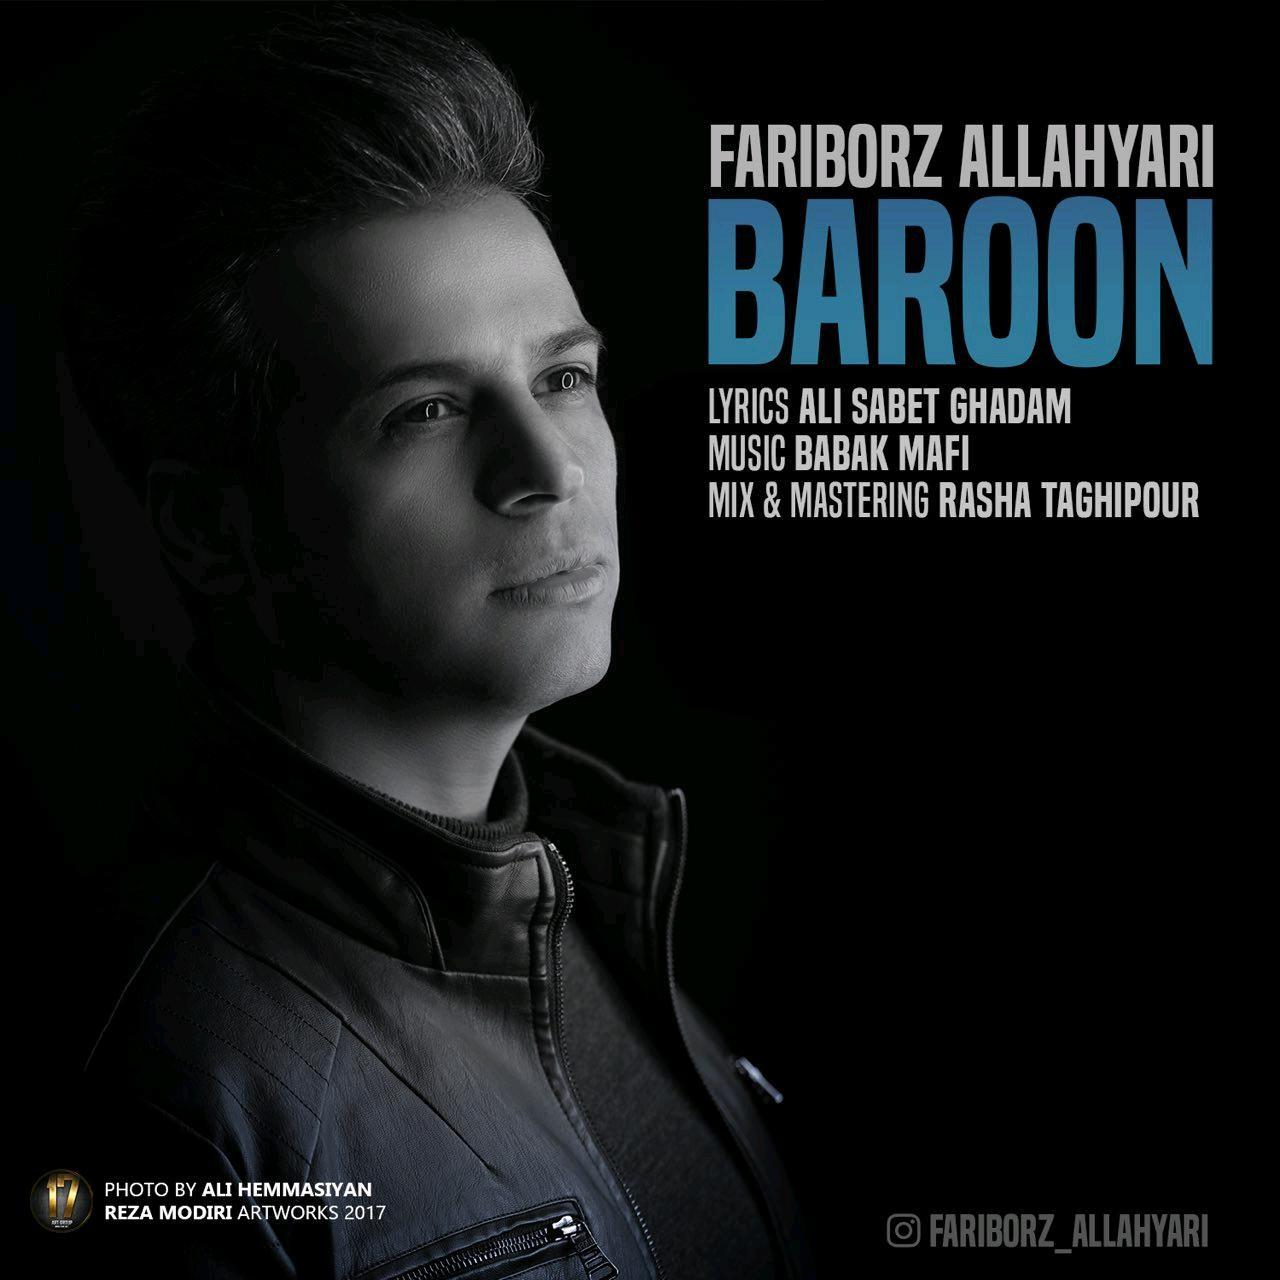 Fariborz Allahyari – Baroon